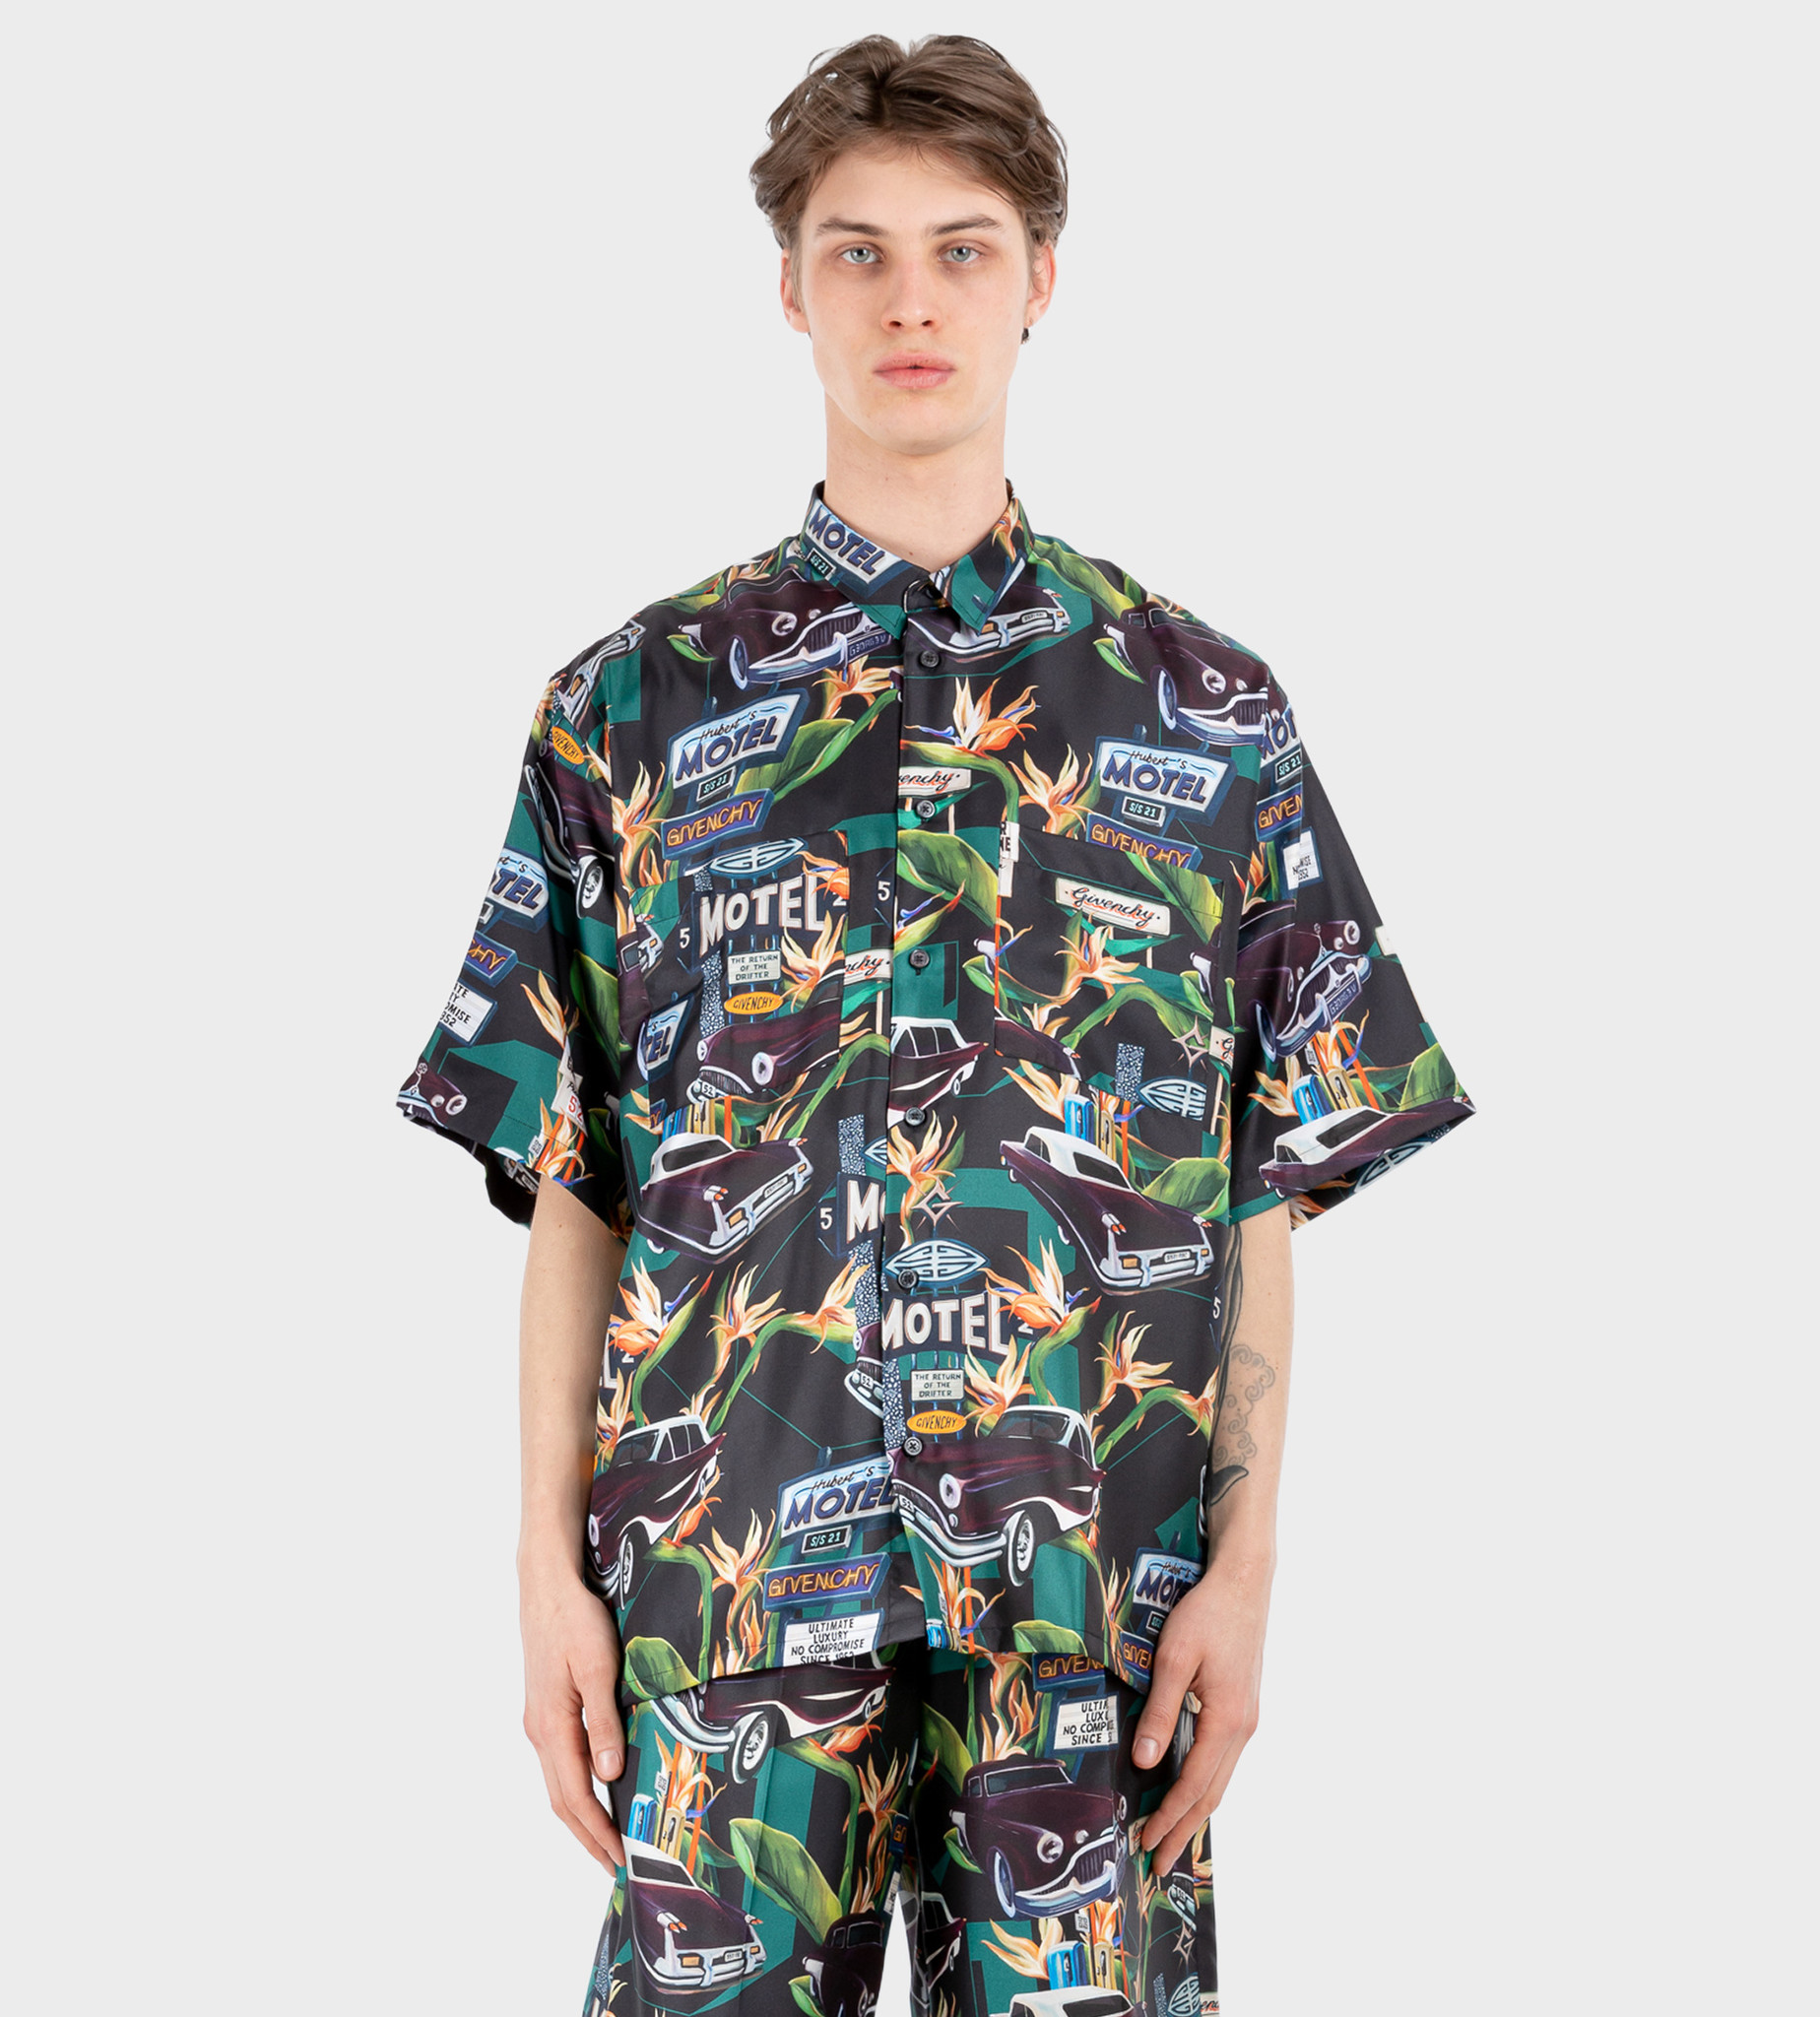 GIVENCHY Motel Shirt in Silk Black